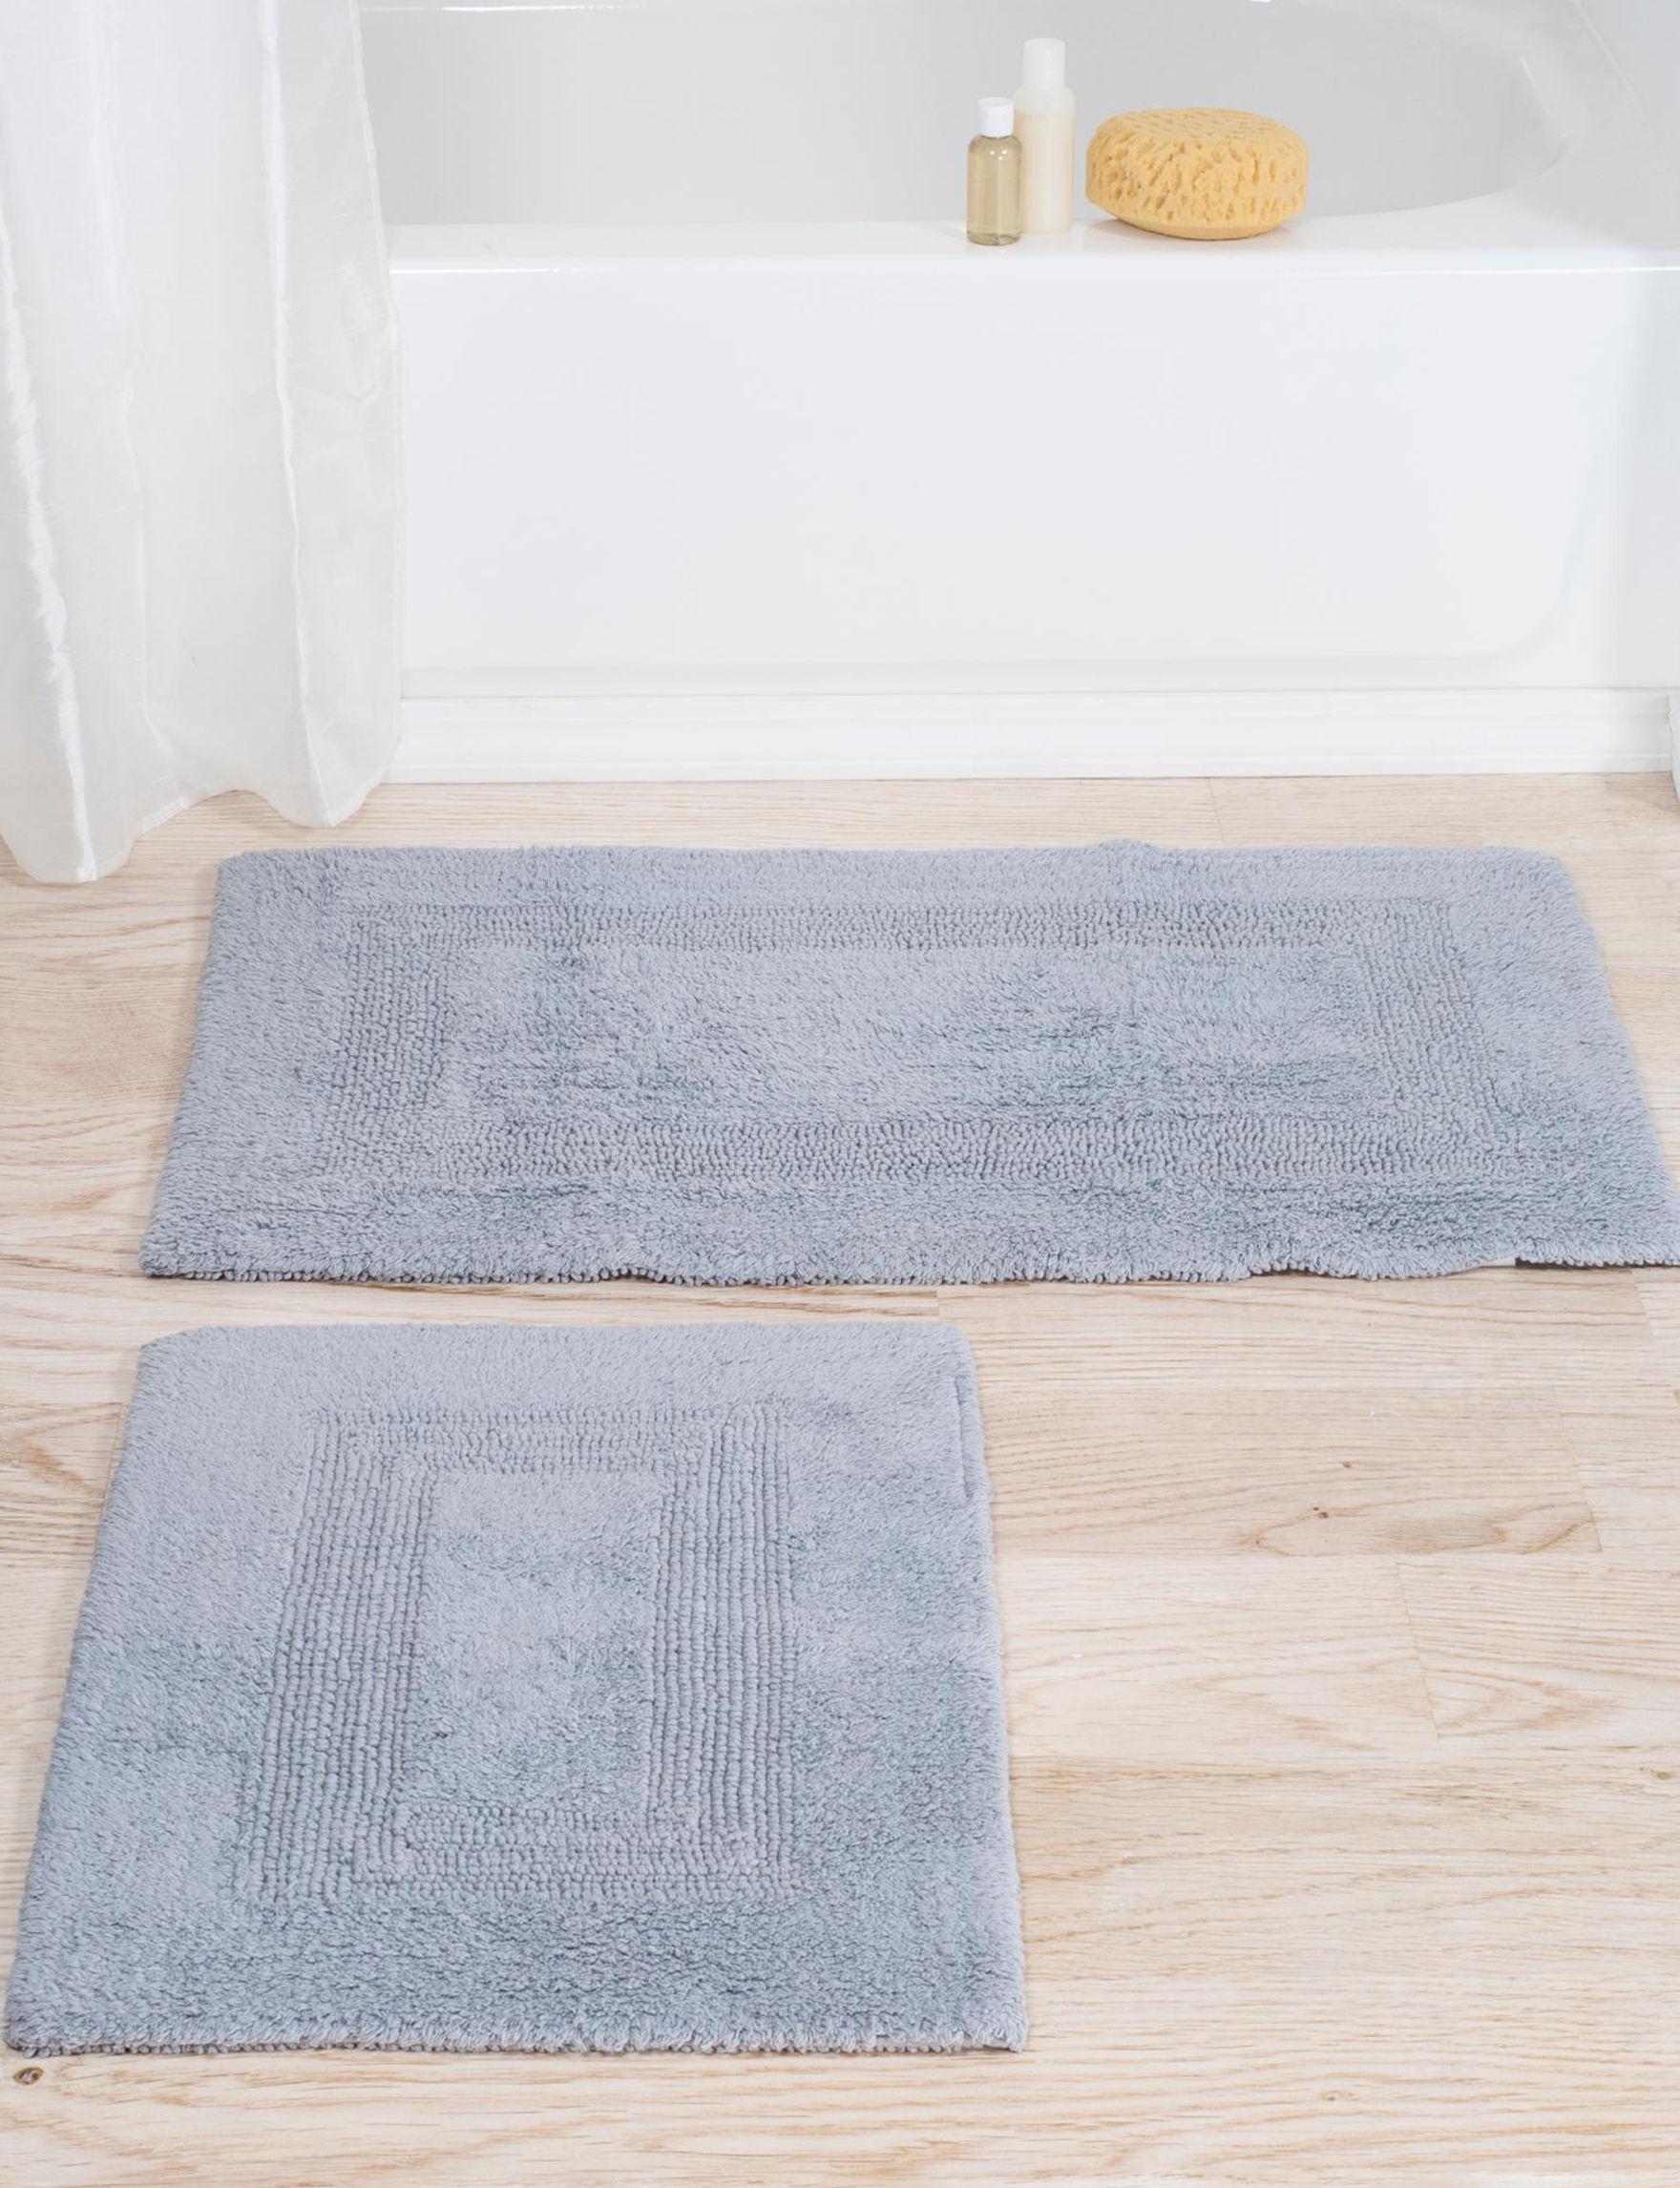 Lavish Home Silver Bath Rugs & Mats Rugs